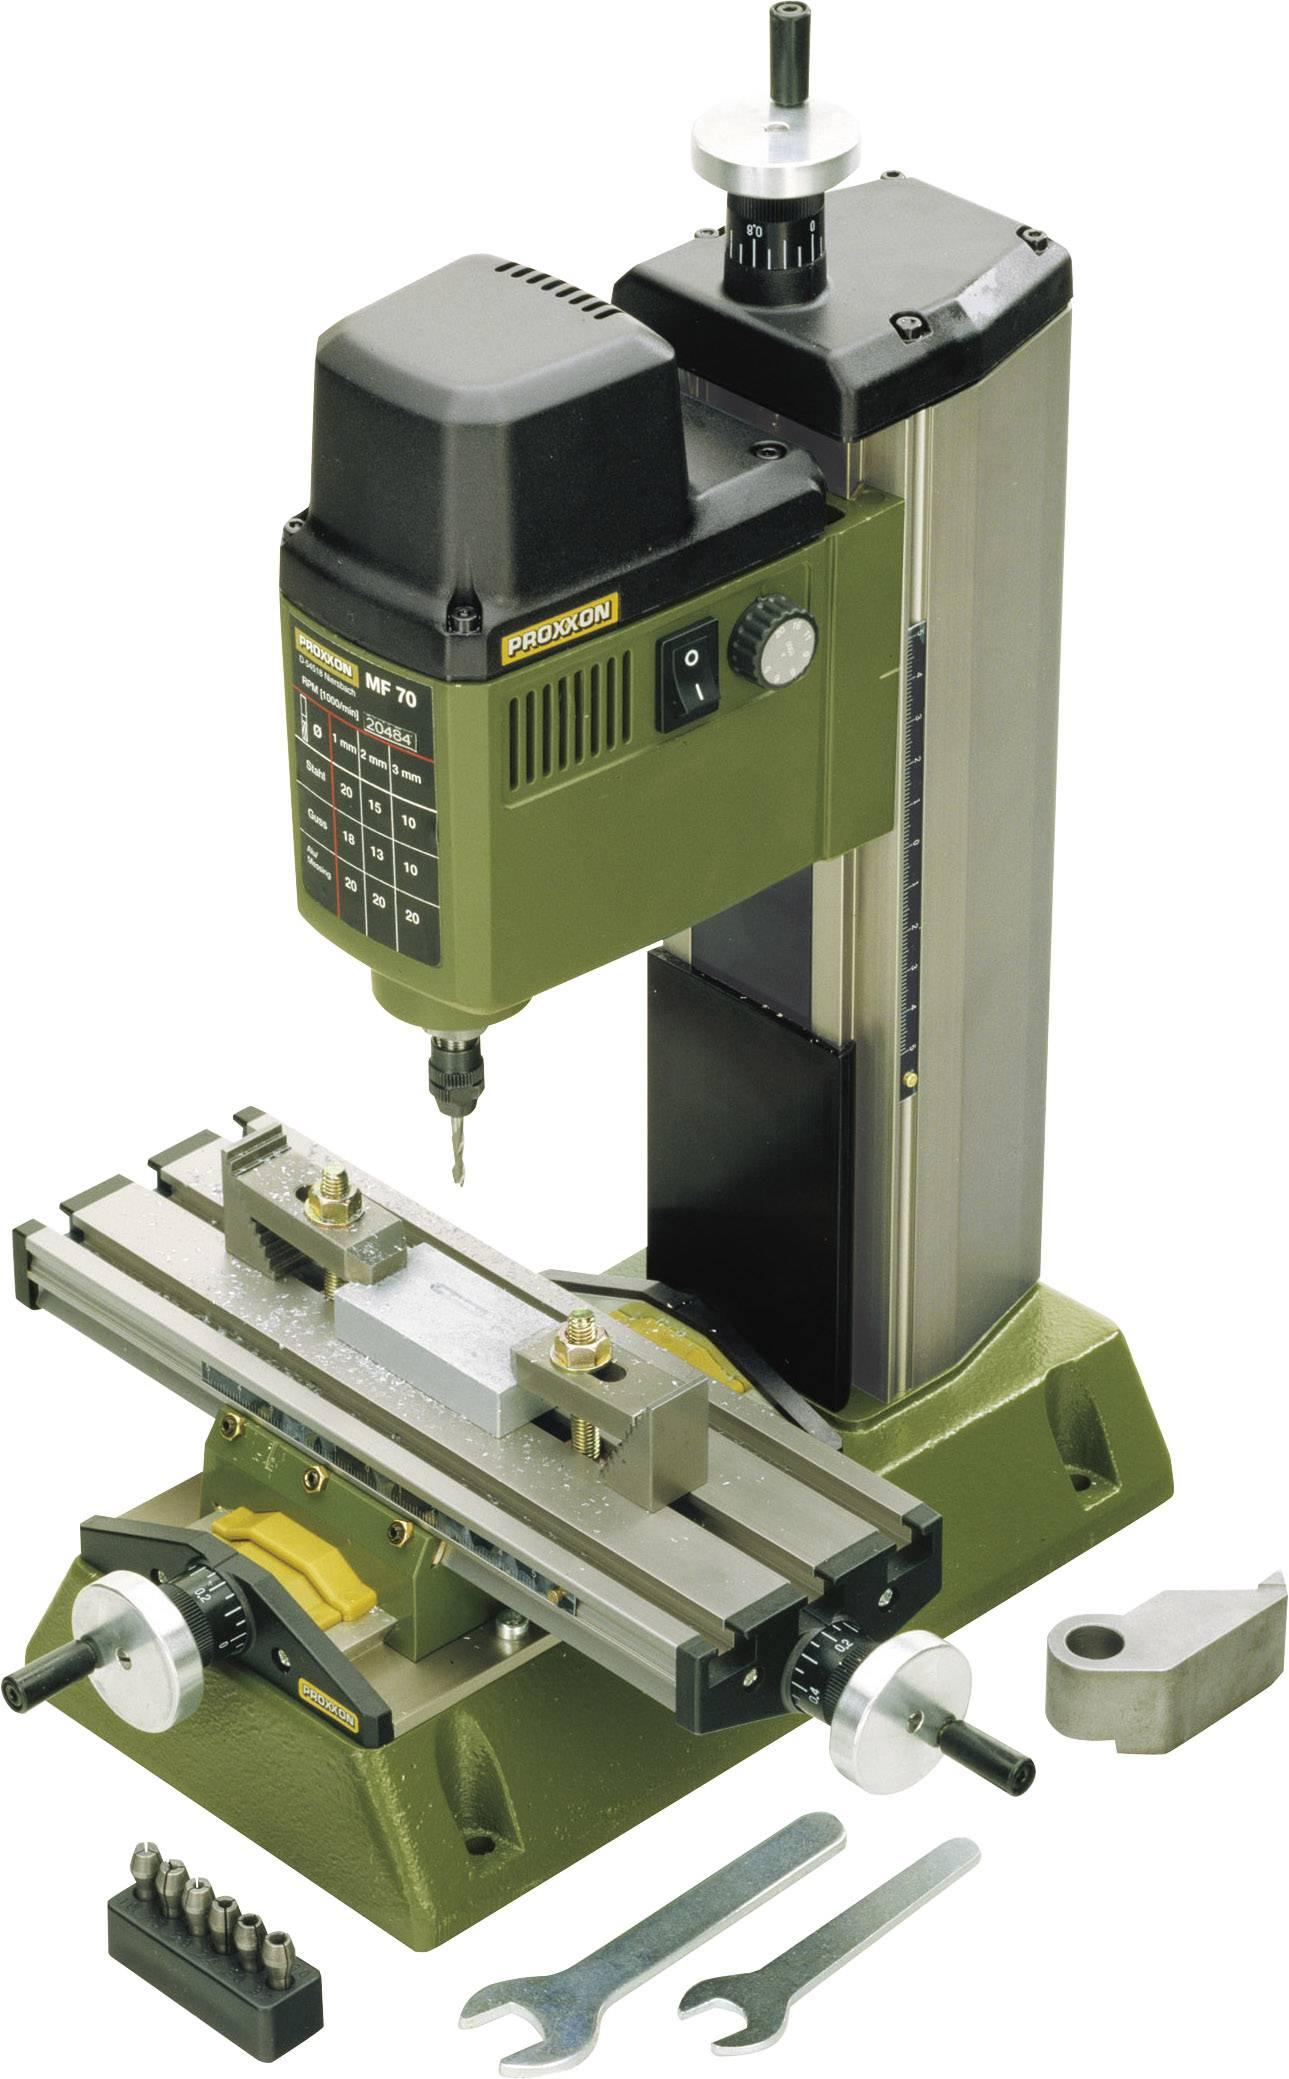 Frézka MF70 Proxxon Micromot 27110, 100 W